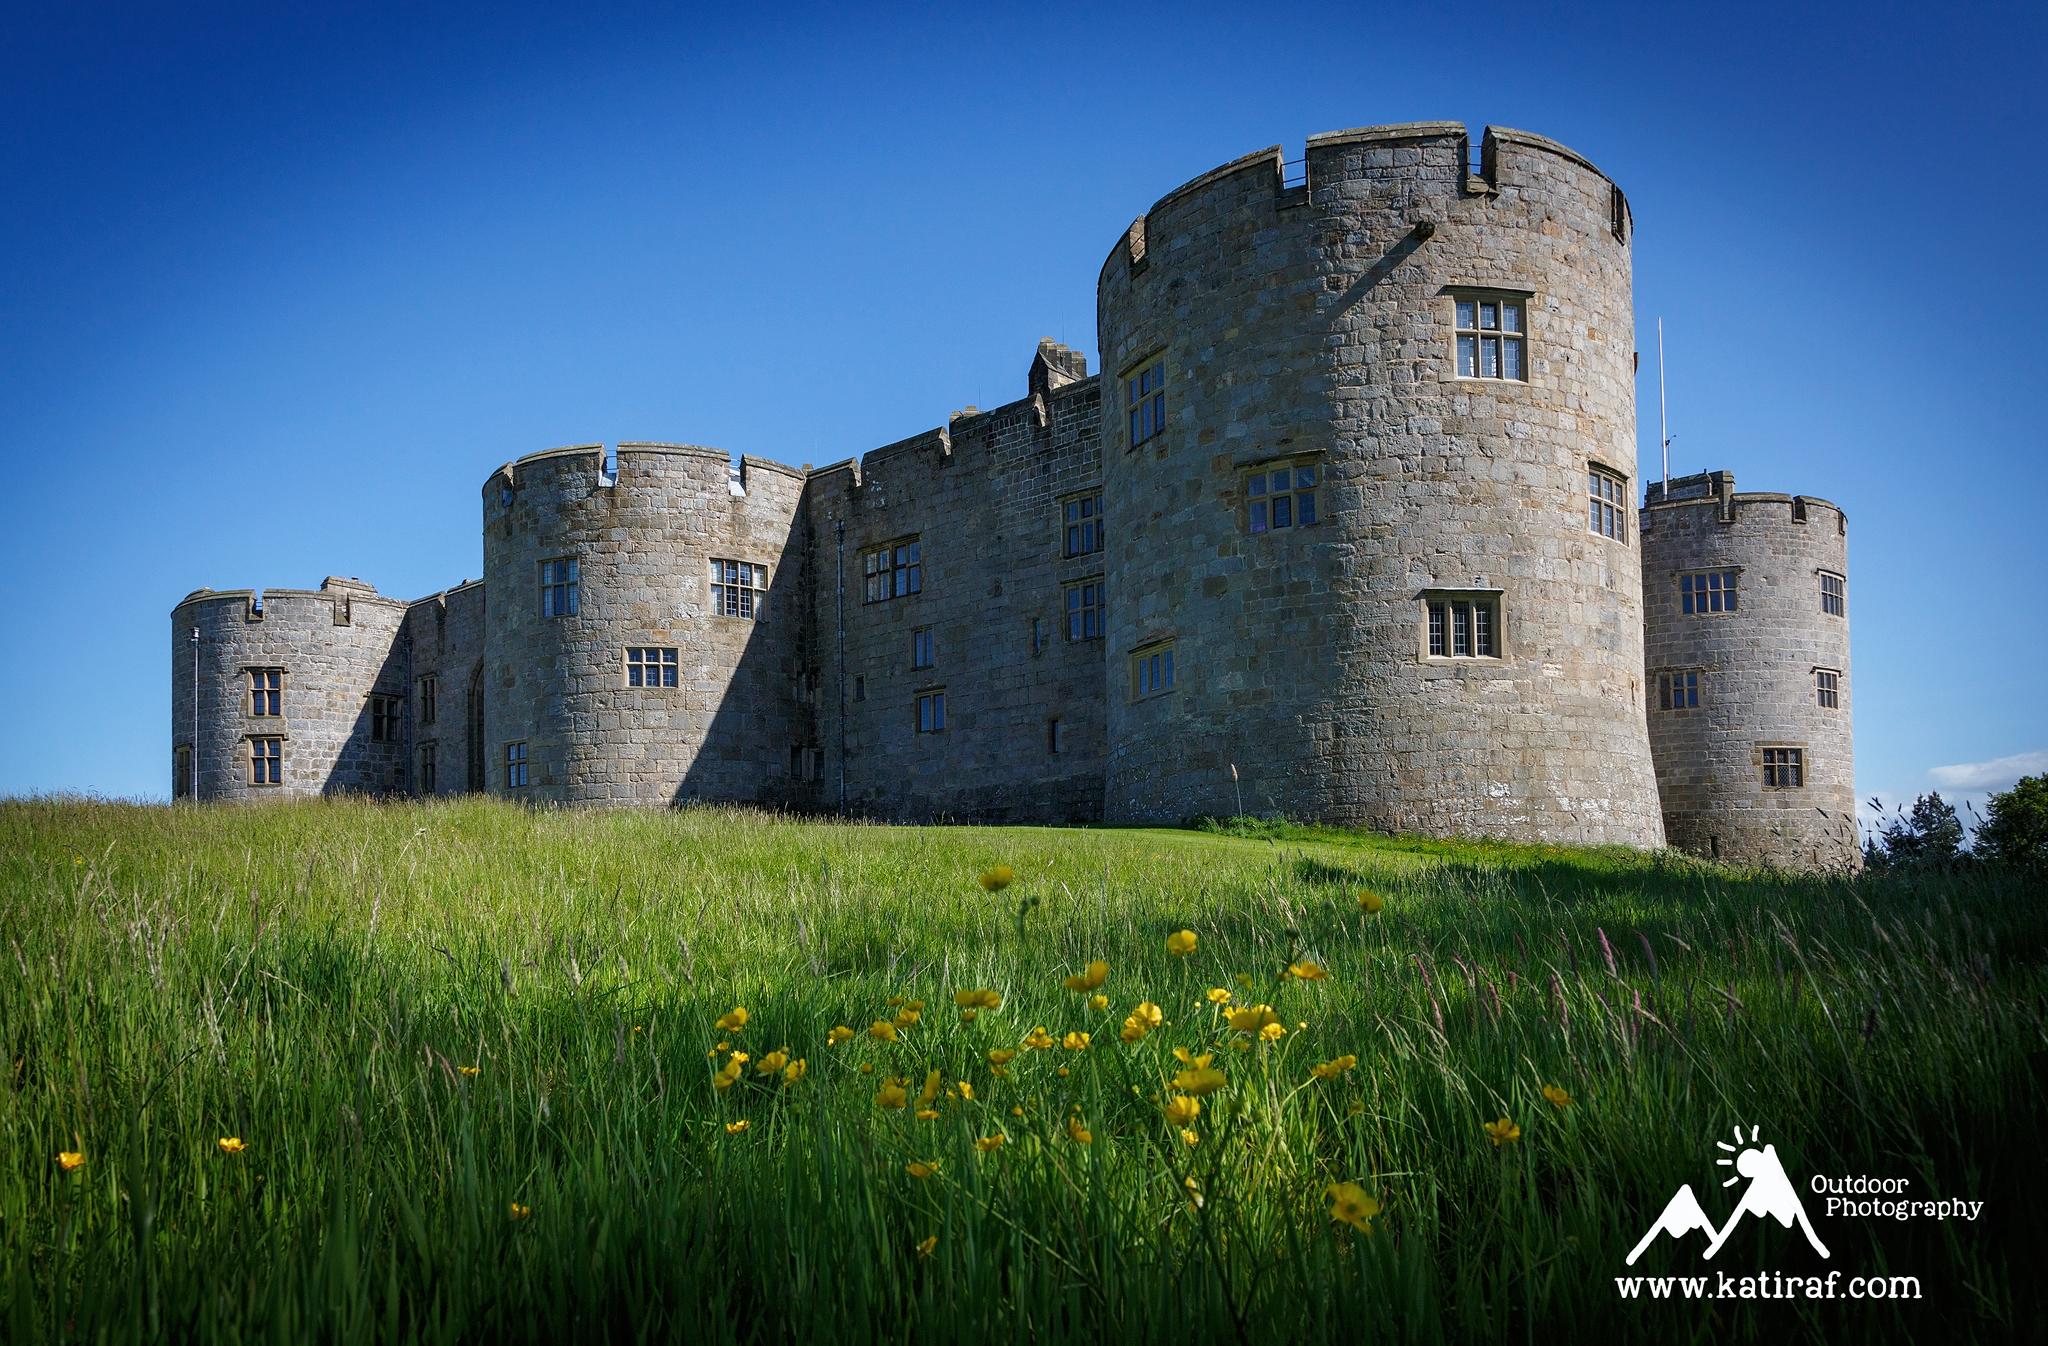 chirk-zamek-castle-katiraf